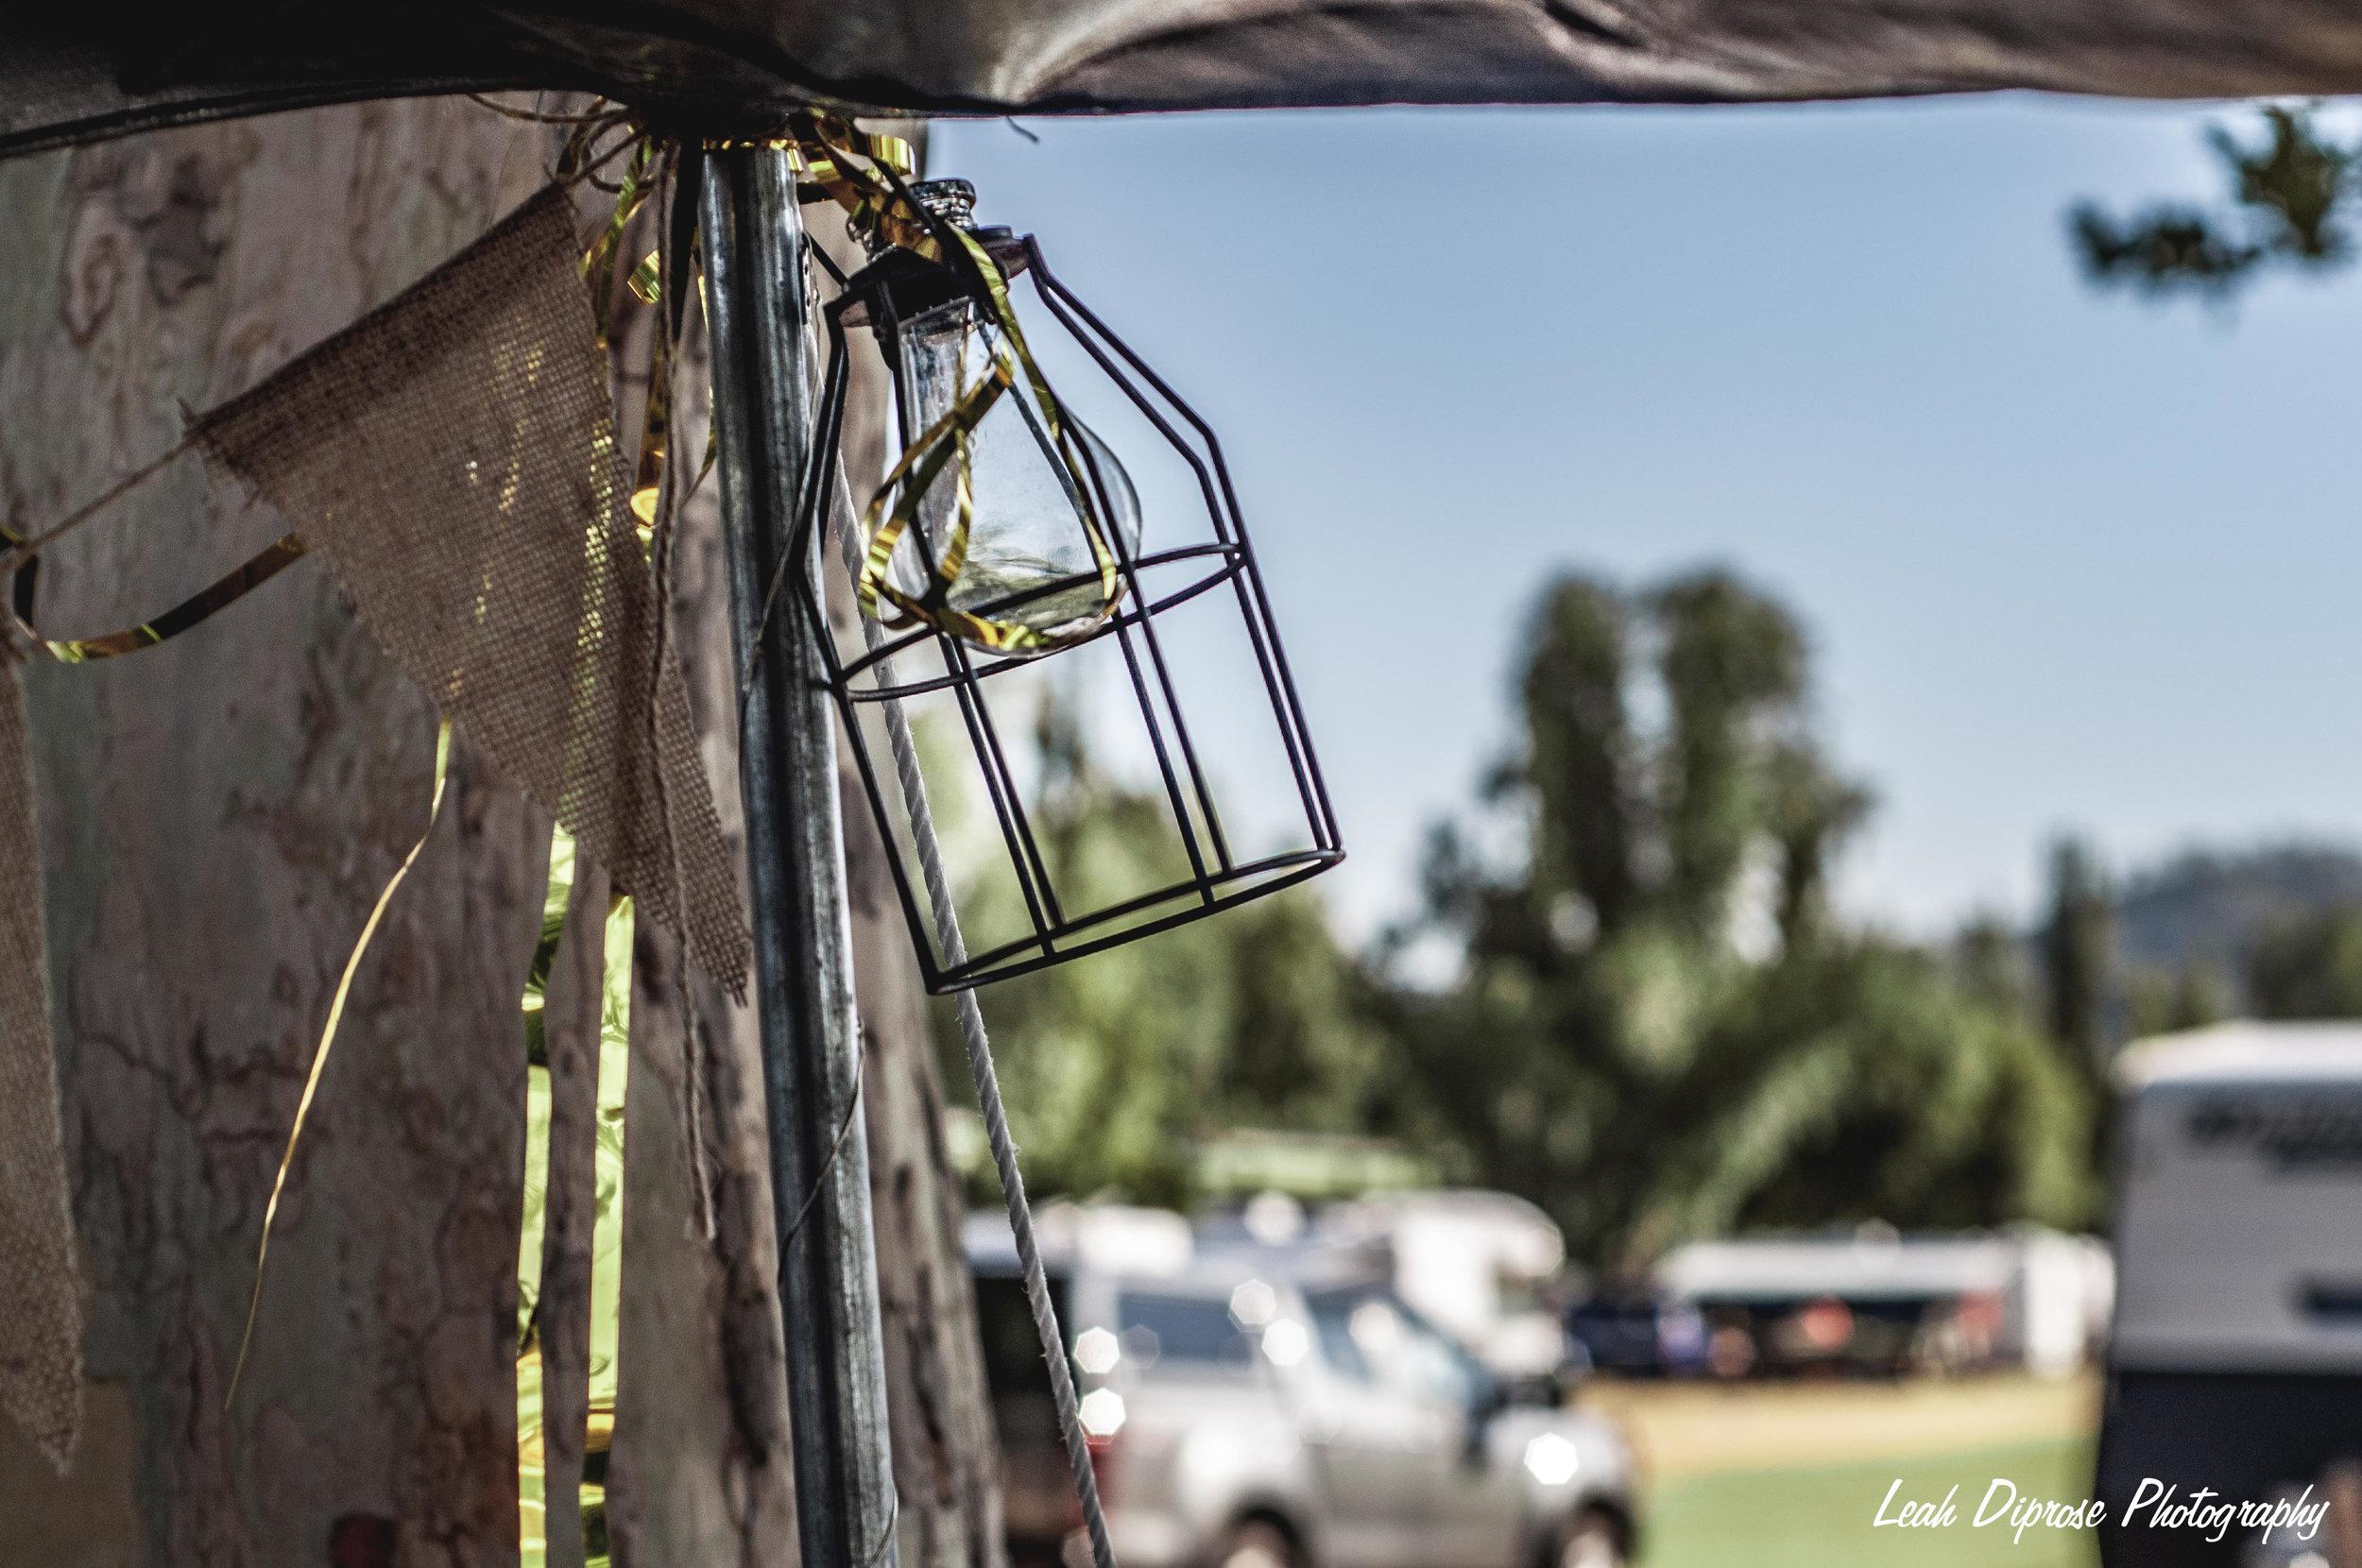 Leah Diprose Photography image-6272.jpg